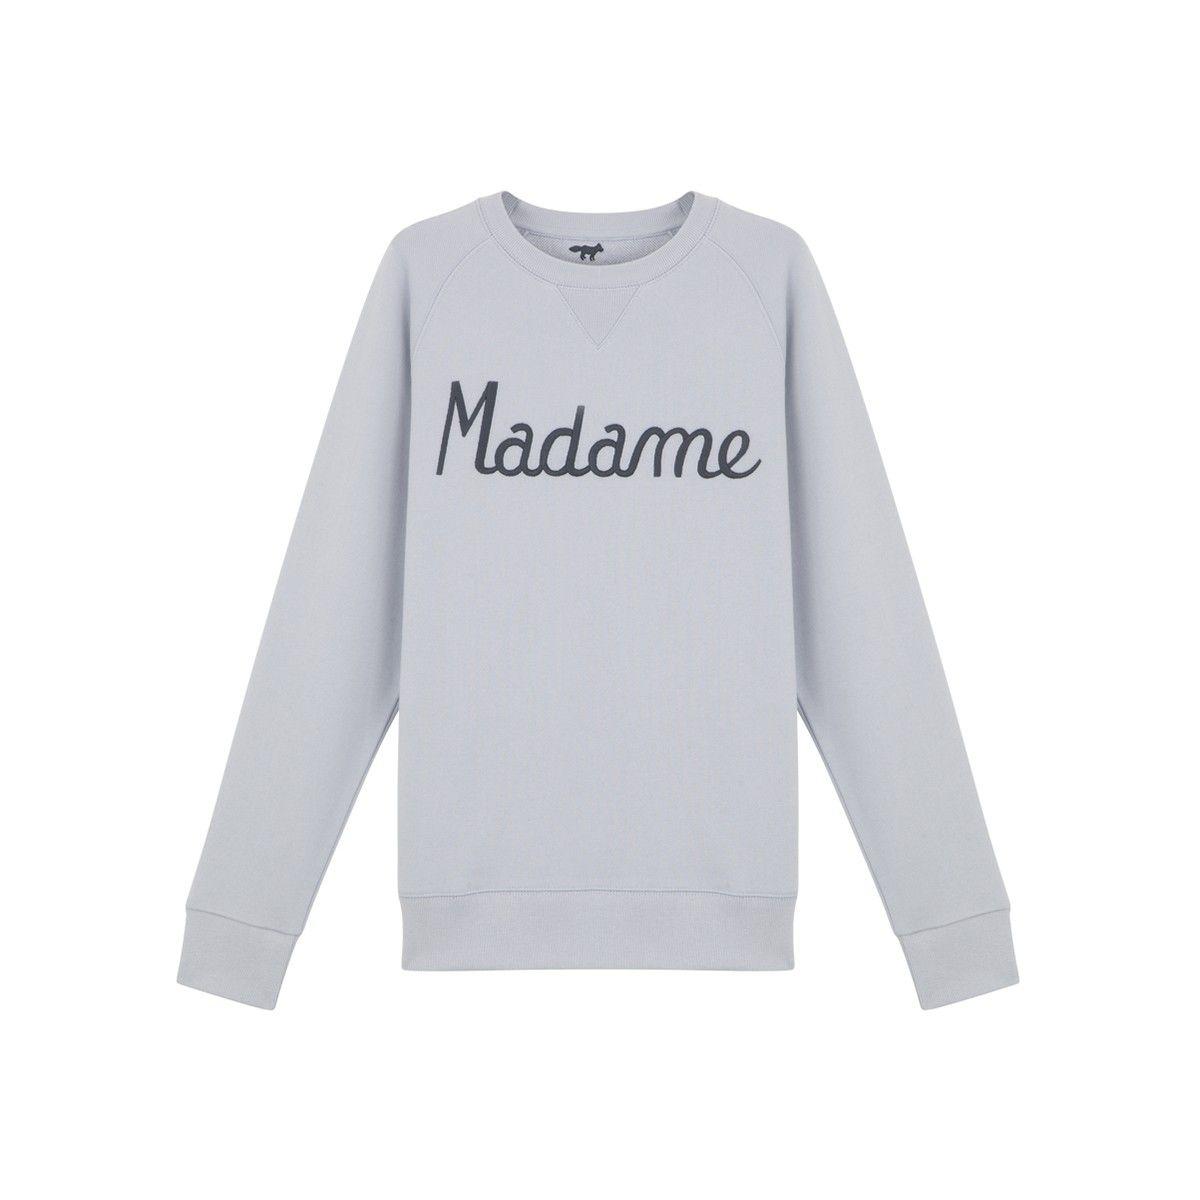 Sweatshirt Madame - Maison Kitsuné